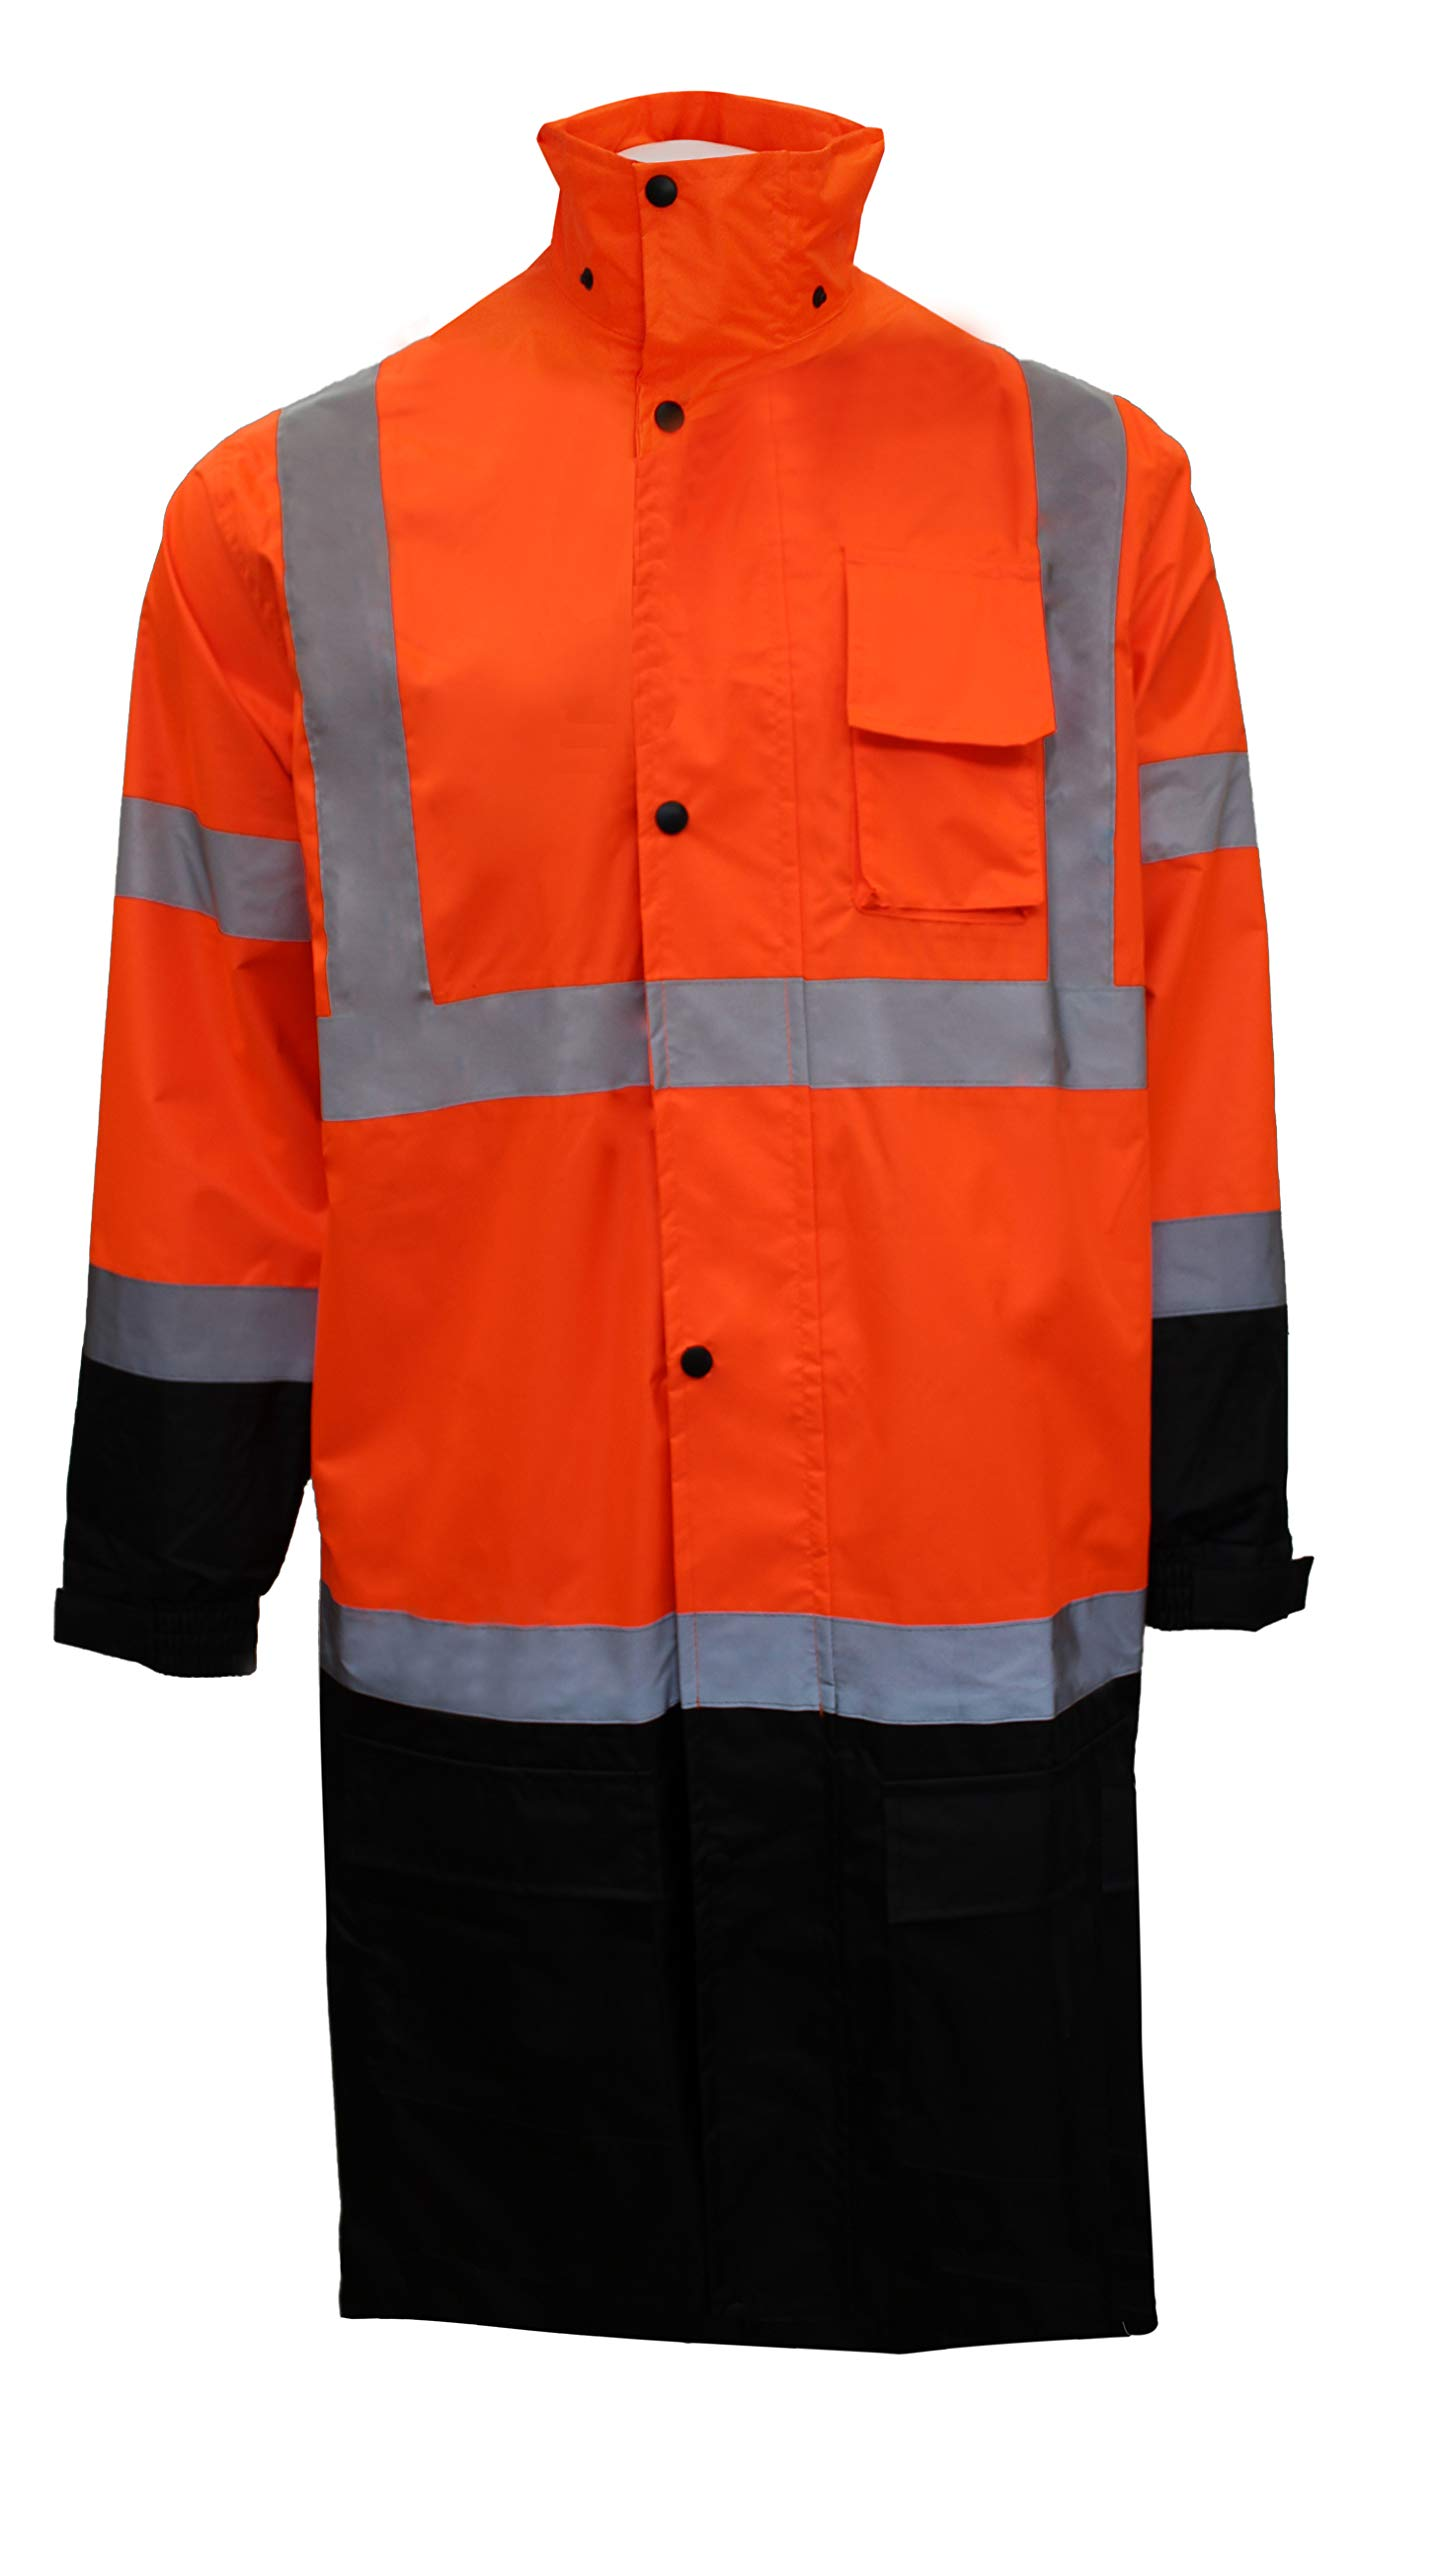 RK Safety RC-CLA3-OR44 Class 3 Rainwear Reflective Hi-Viz Black Bottom Long Rain Coat (Large, Orange) by New York Hi-Viz Workwear